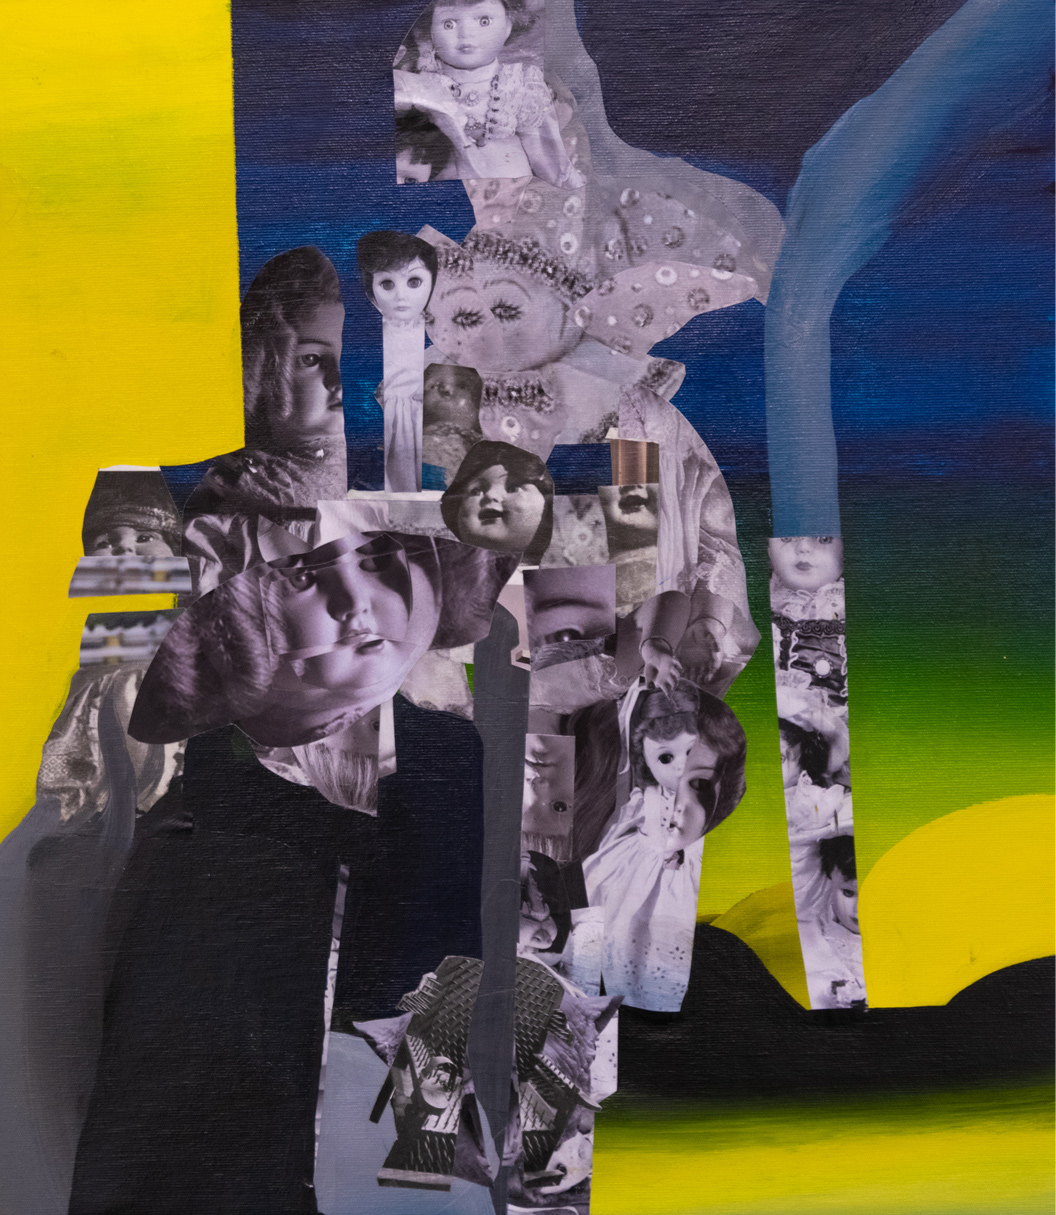 Christos Katsinis, School Primer X, mixed media (collage and acrylics on canvas), 50x43 cm